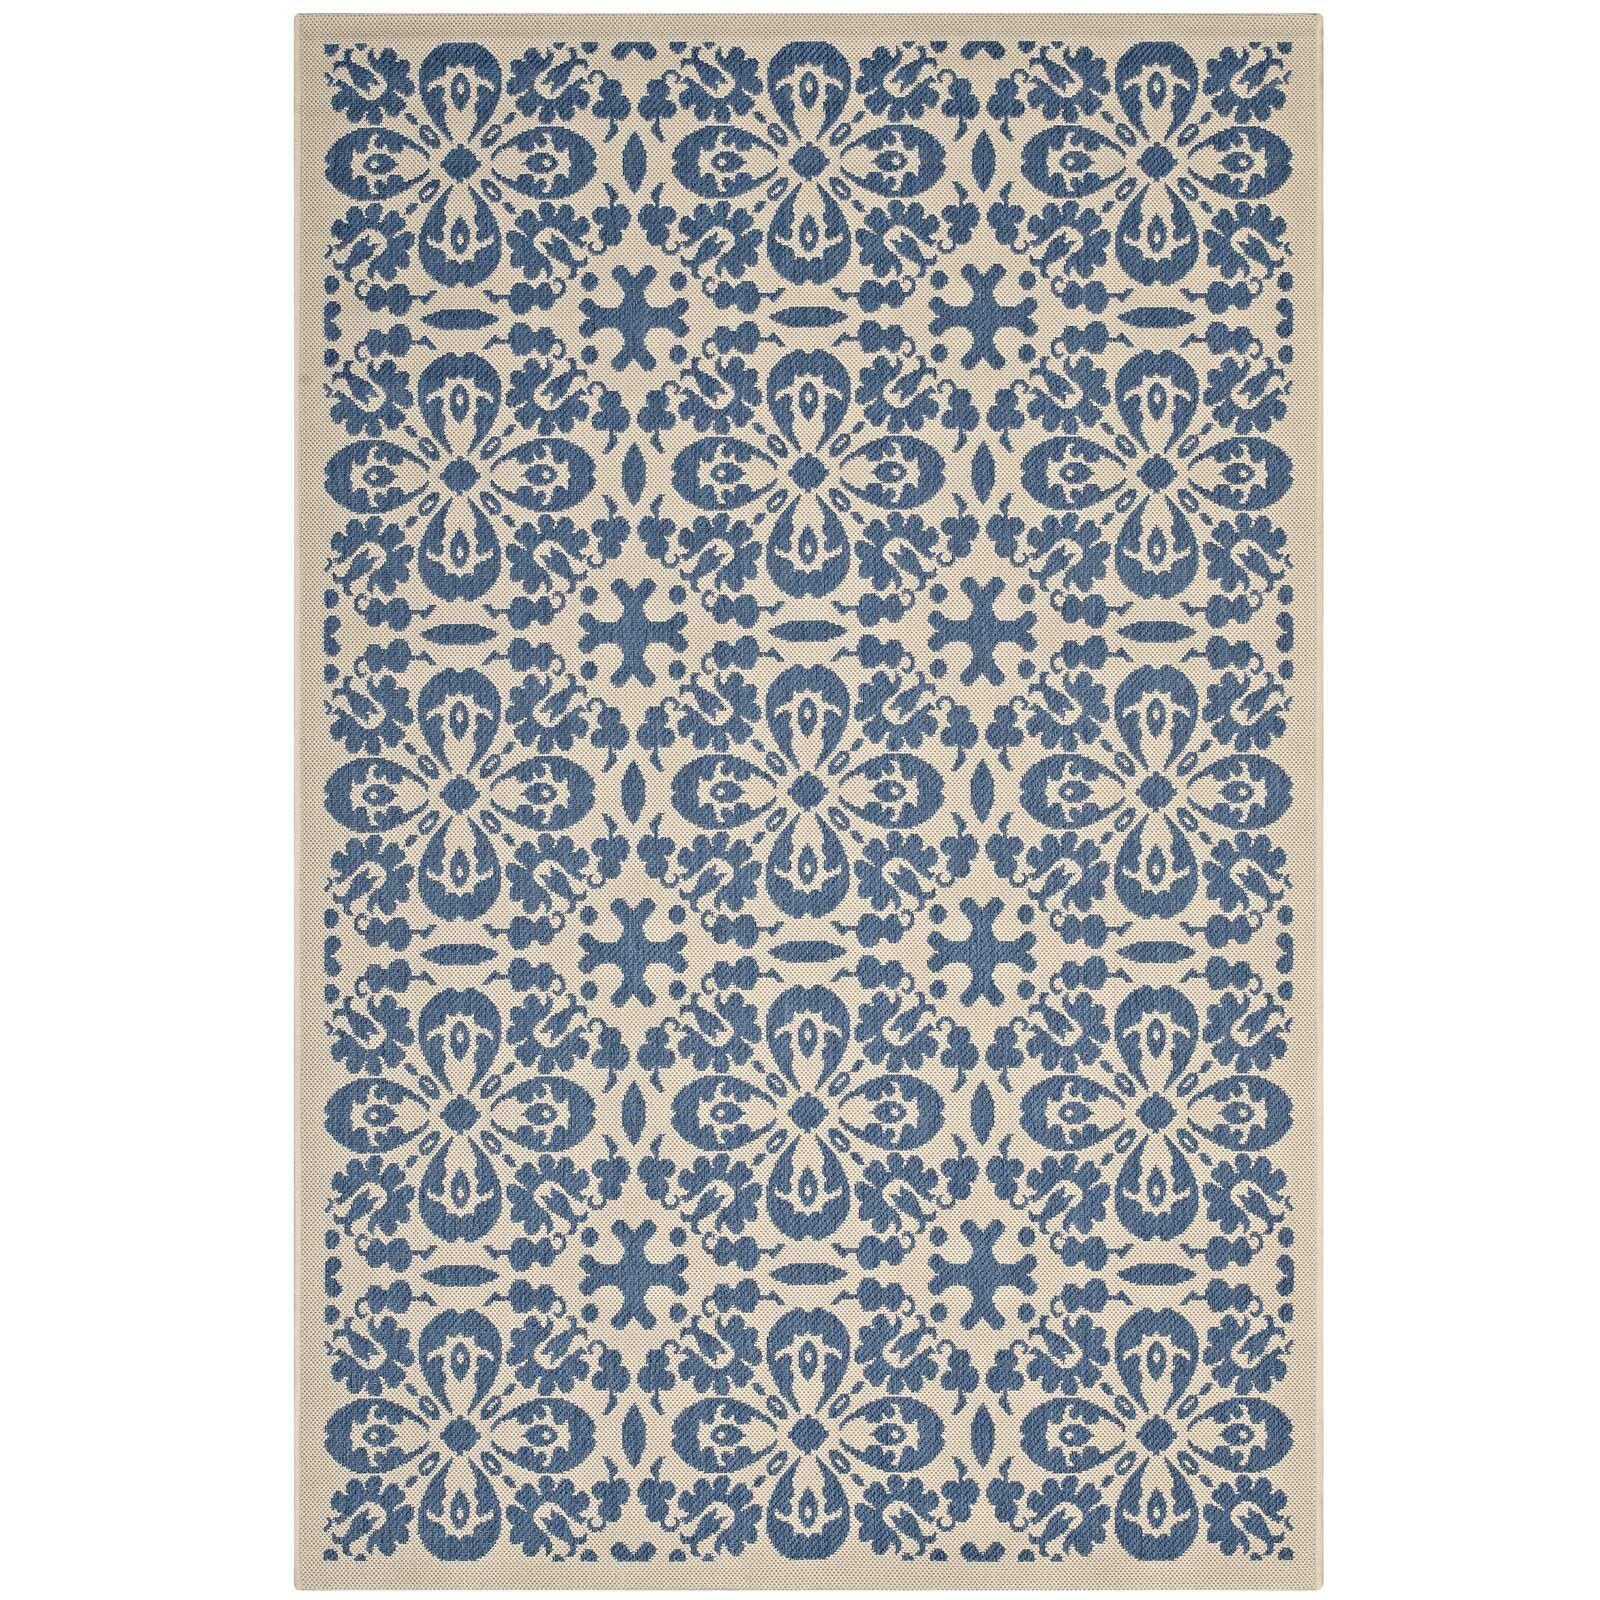 Herzberg Vintage Floral Blue/Beige Indoor/Outdoor Area Rug Rug Size: Rectangle 5' x 8'